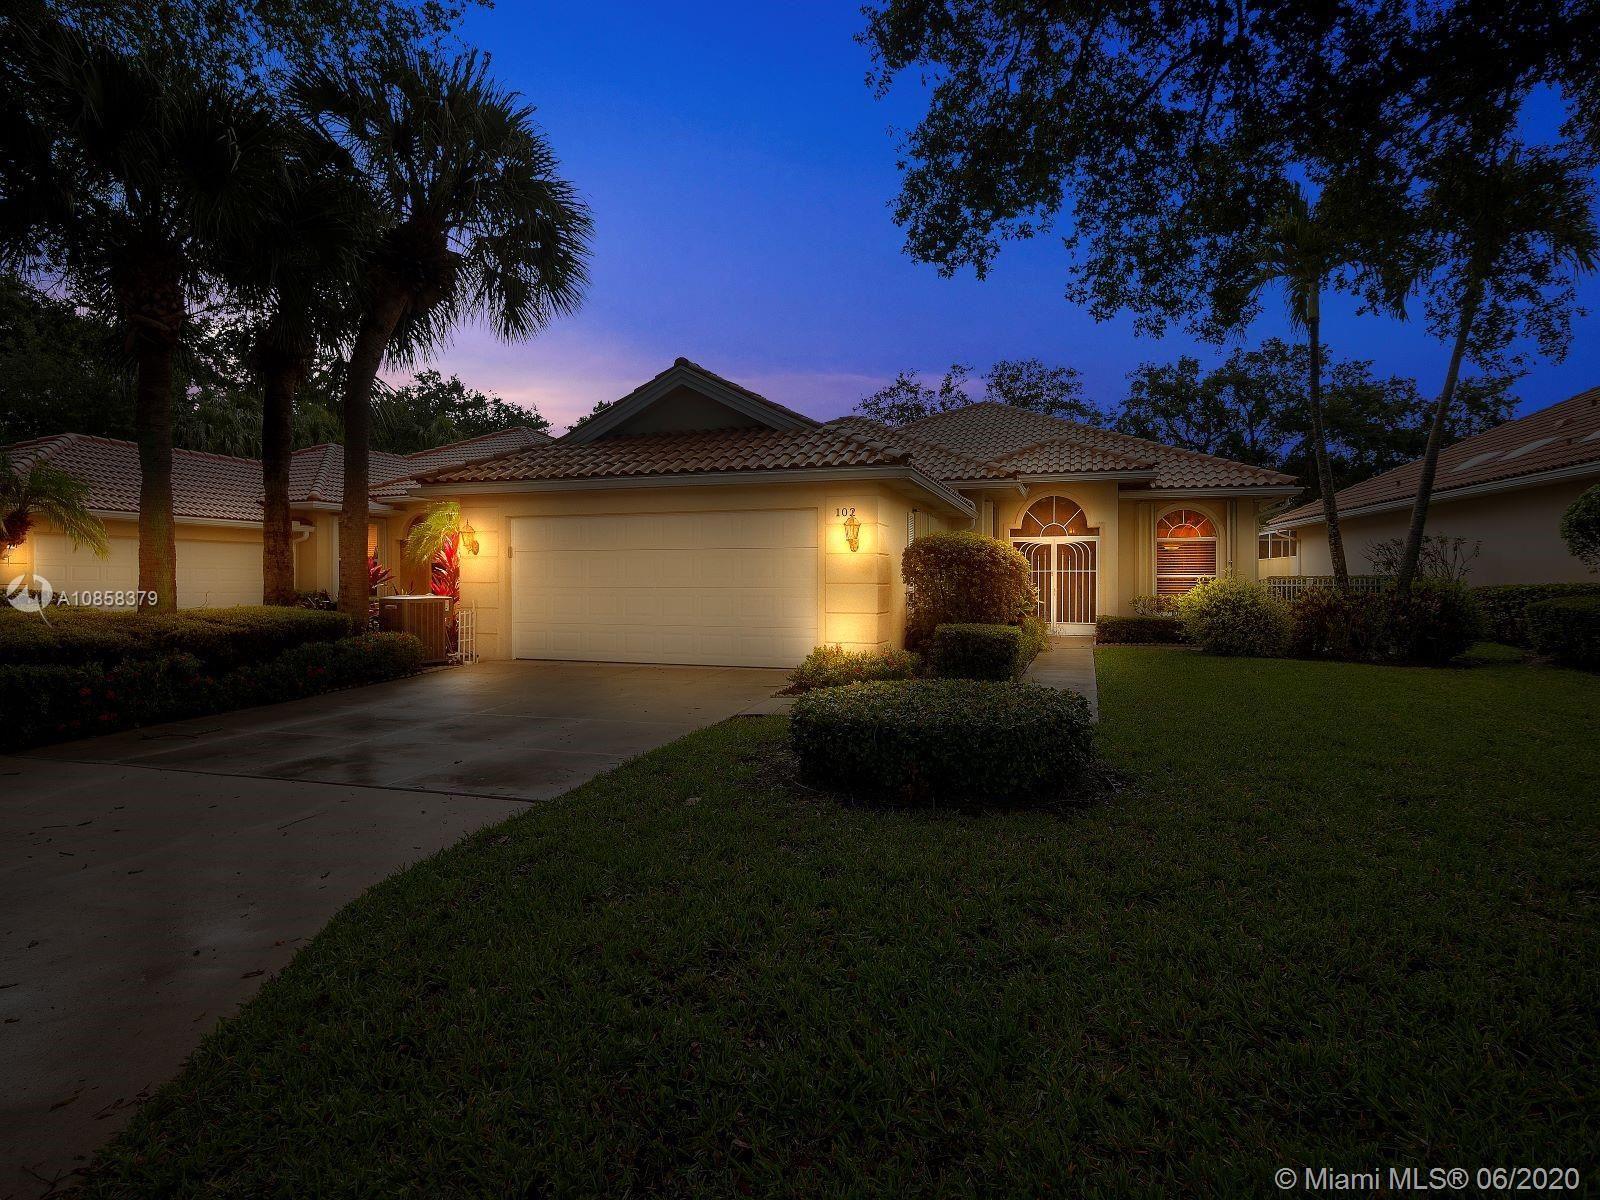 102 Winter Club Court, Palm Beach Gardens, FL 33410 - #: A10858379